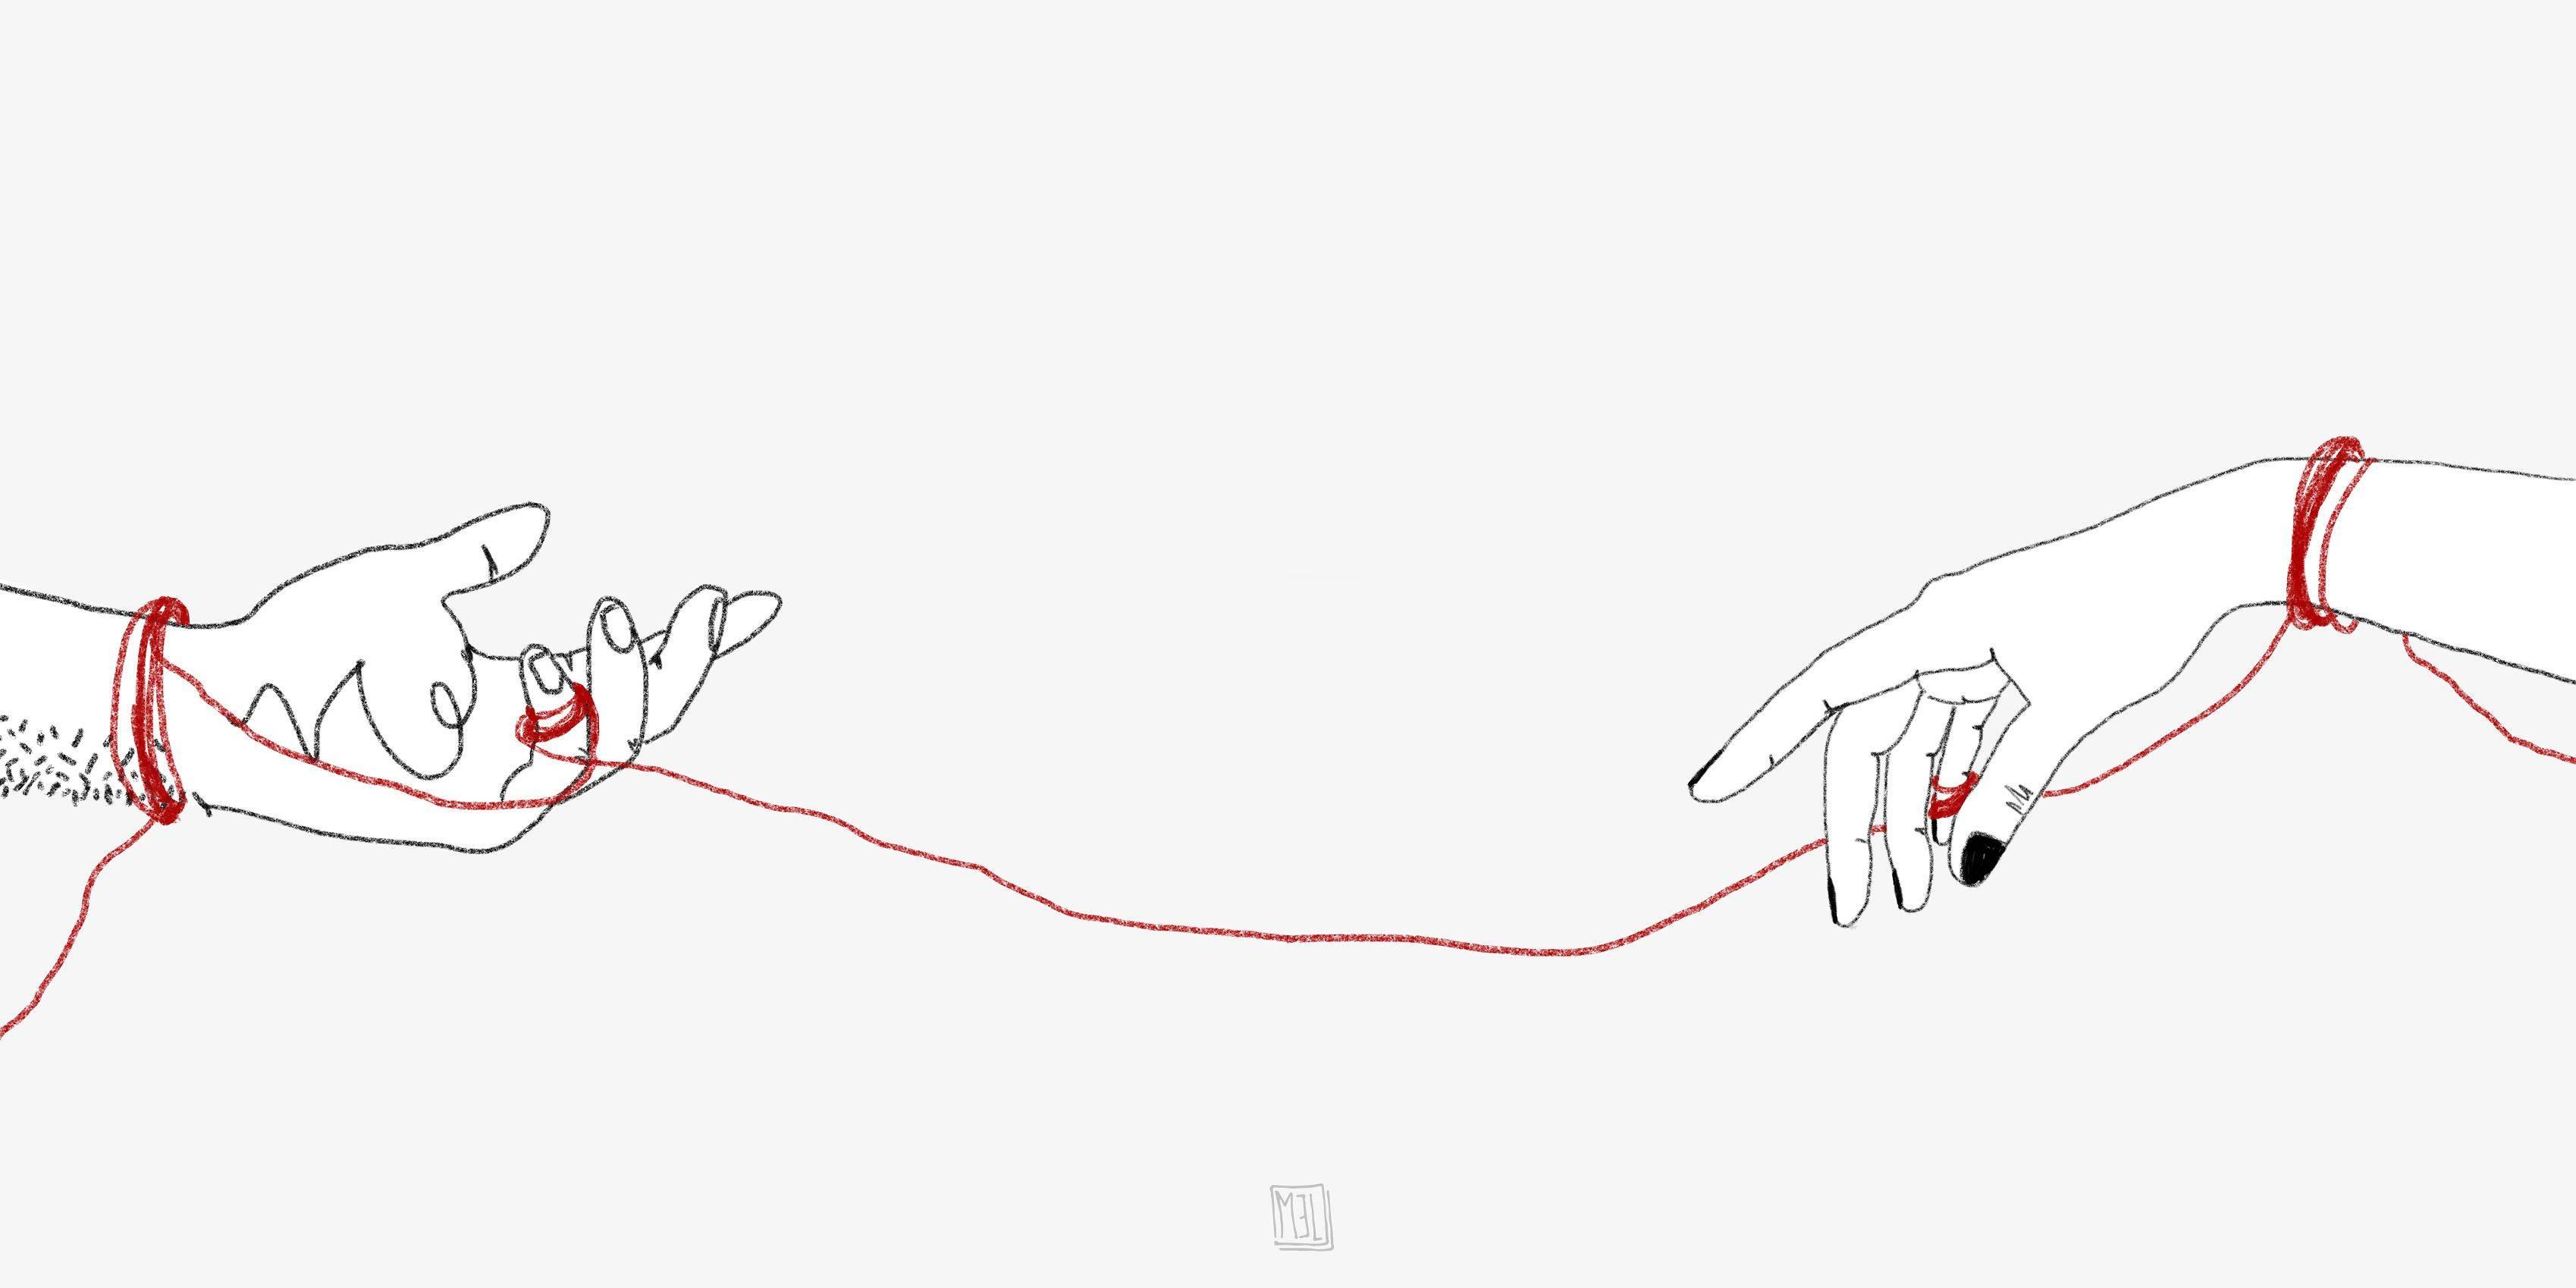 Квест red thread of fate (красная нить судьбы) — база знаний lineage 2